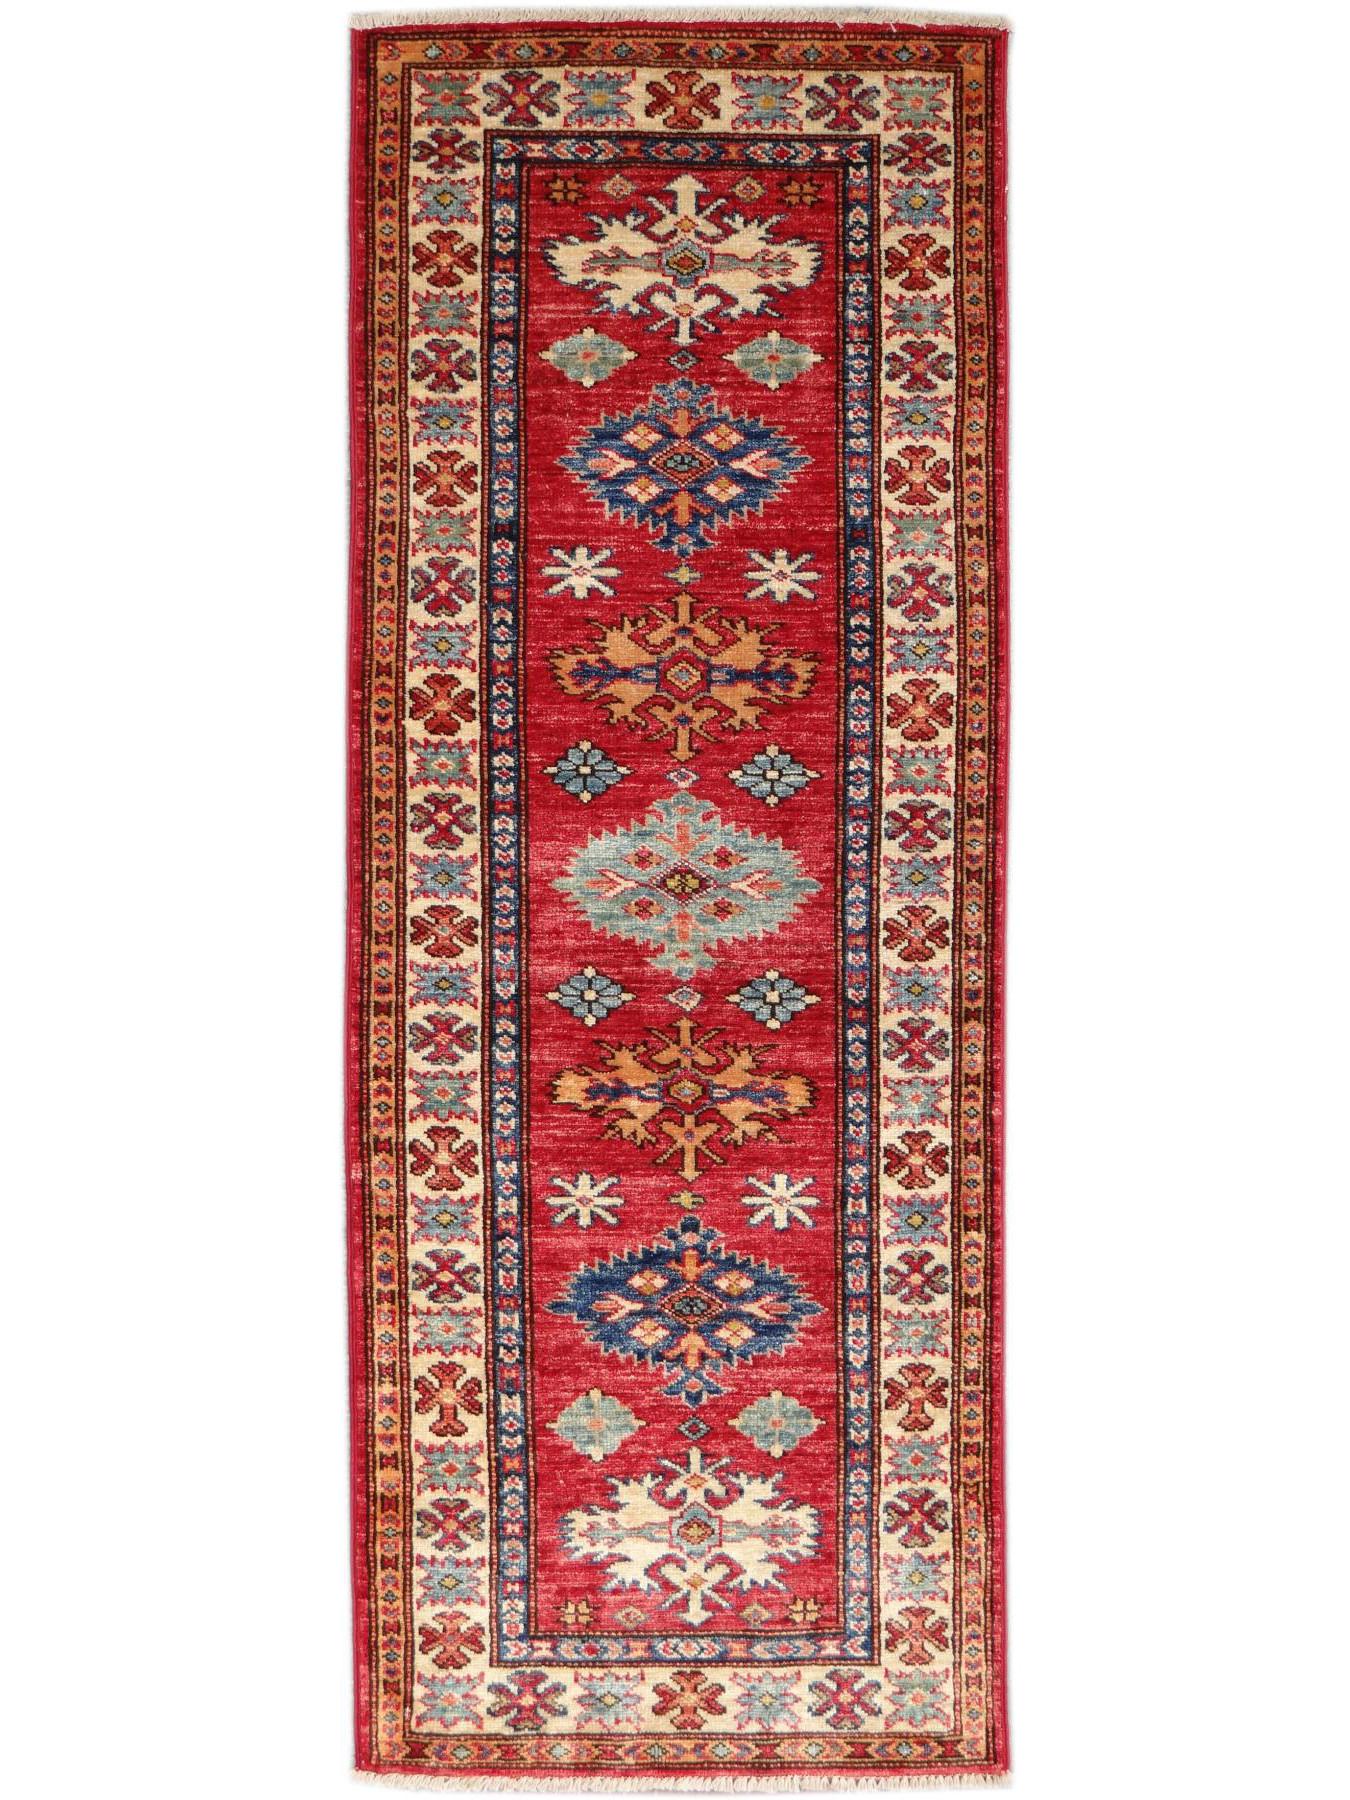 Tapis Ghazni-Kazak - Ghazni extra